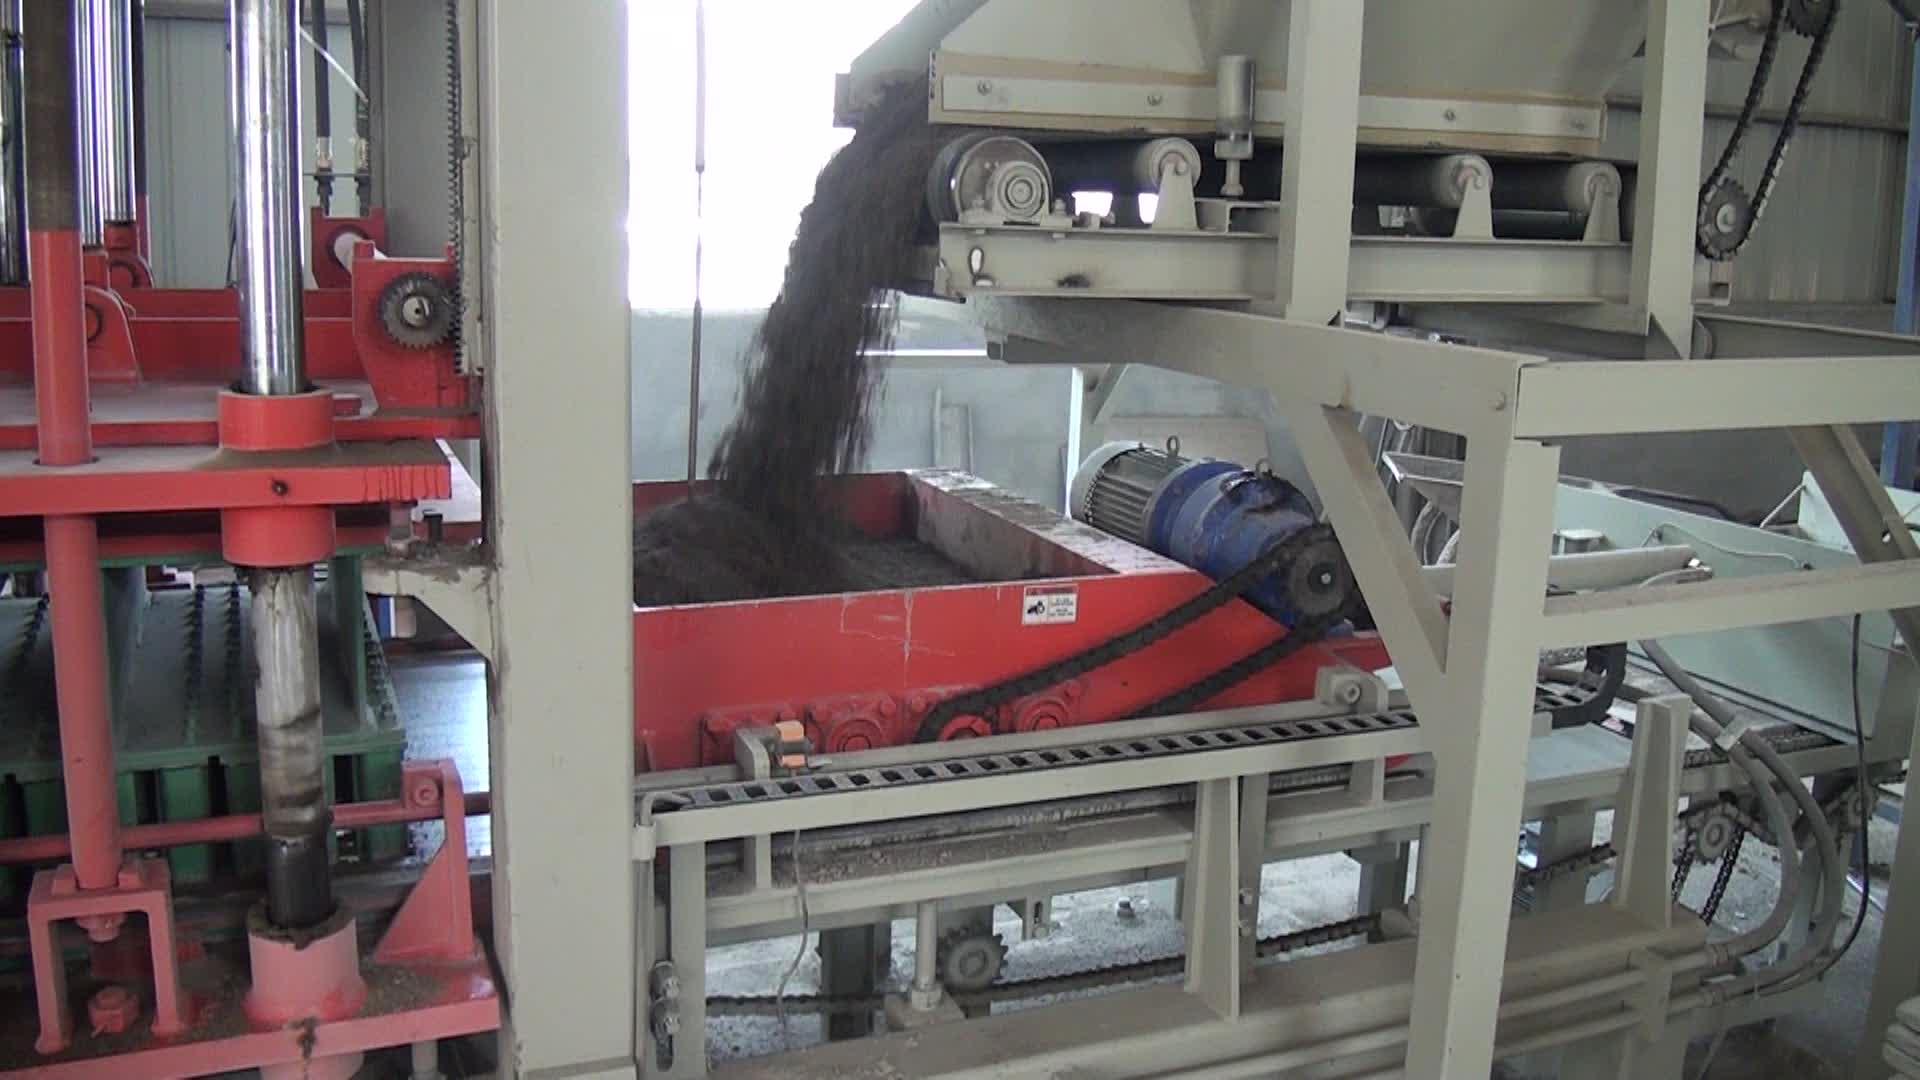 Hot Koop 30% off Direct Fabriek Duitsland Kwaliteit Cement Baksteen Blok Making Machine/Compressed Interlock Straatstenen Blok Machine